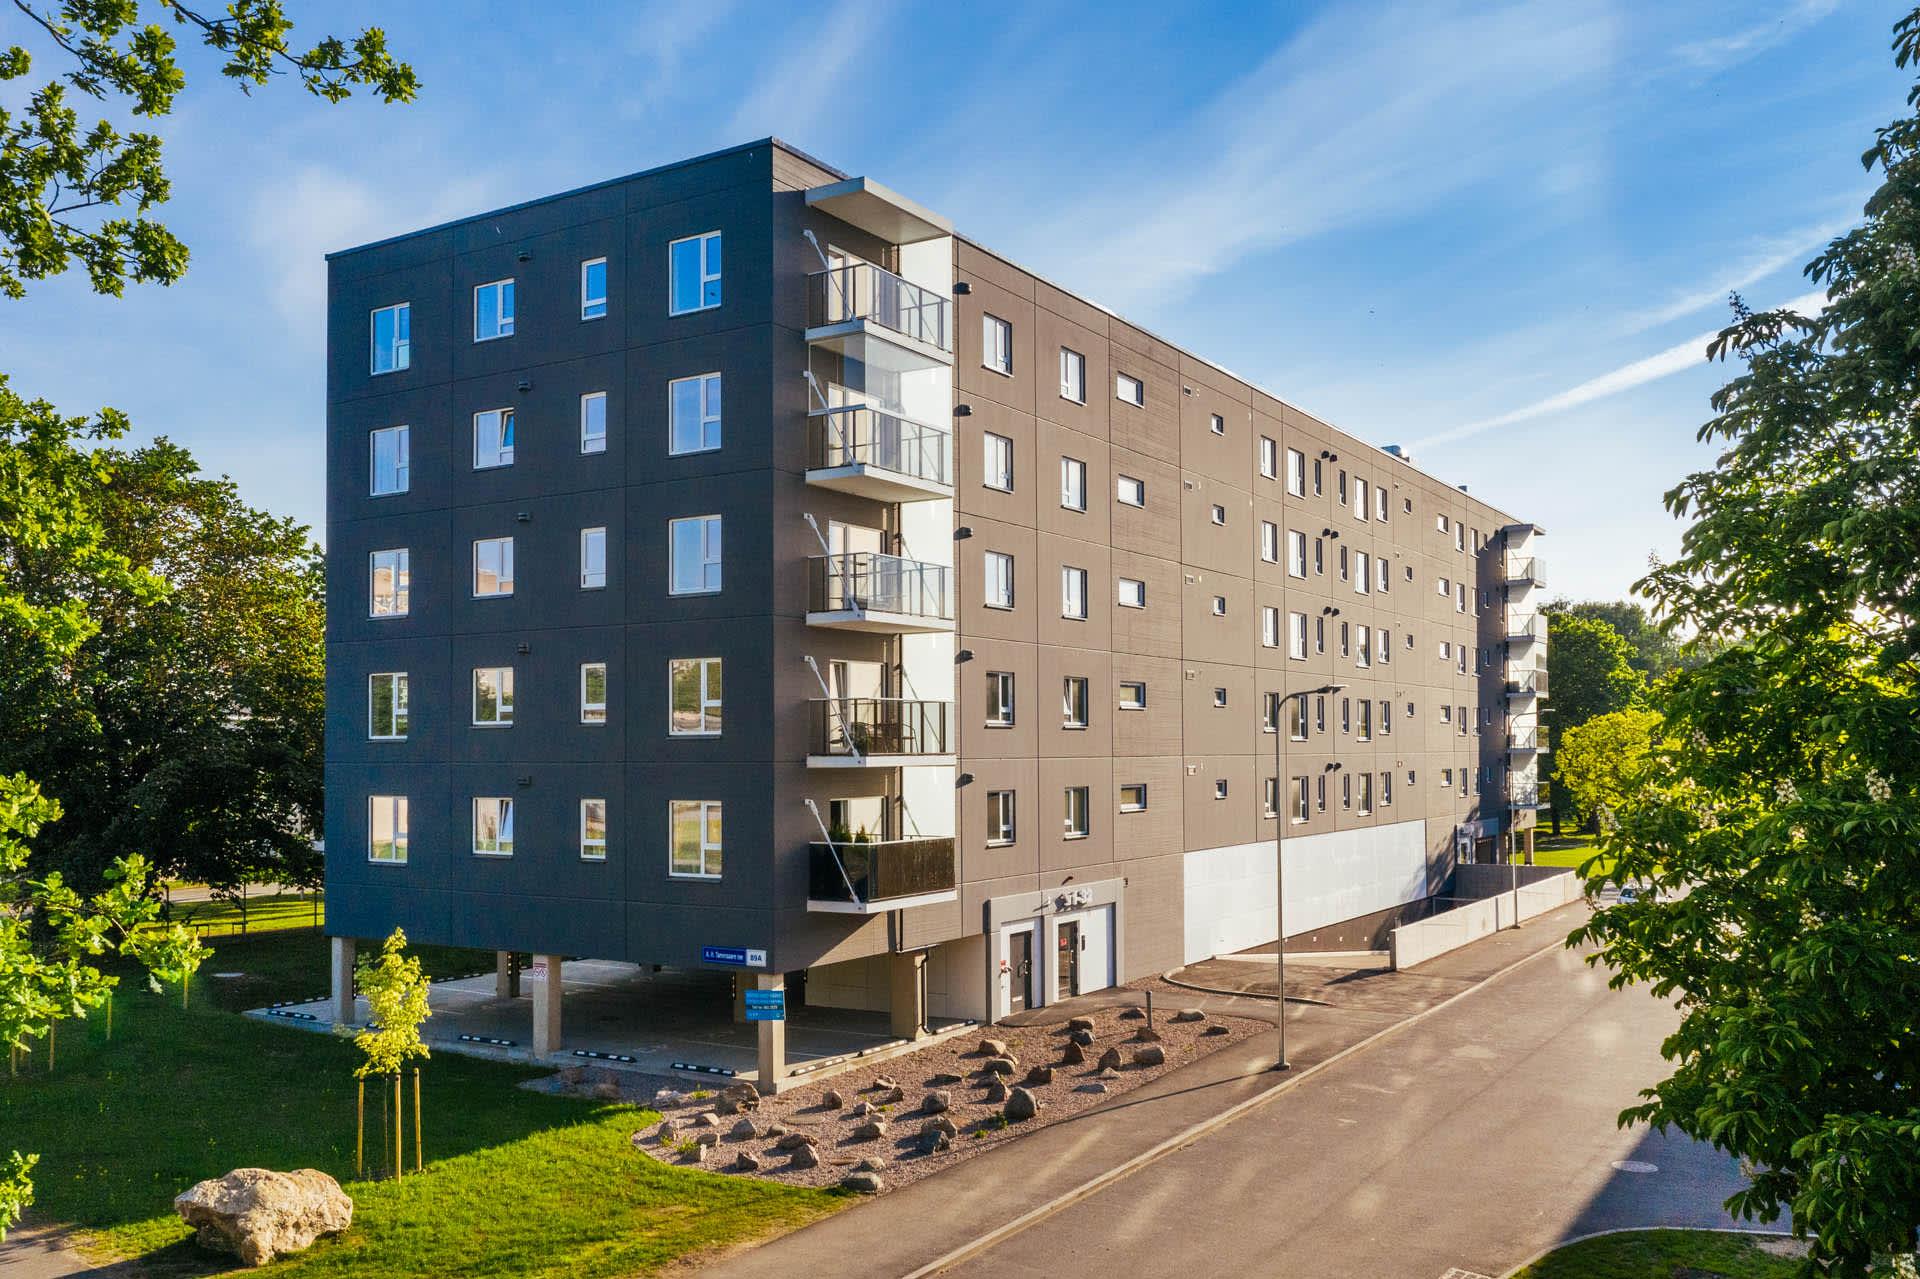 Многоквартирный дом по адресу А.Х. Таммсааре 89a